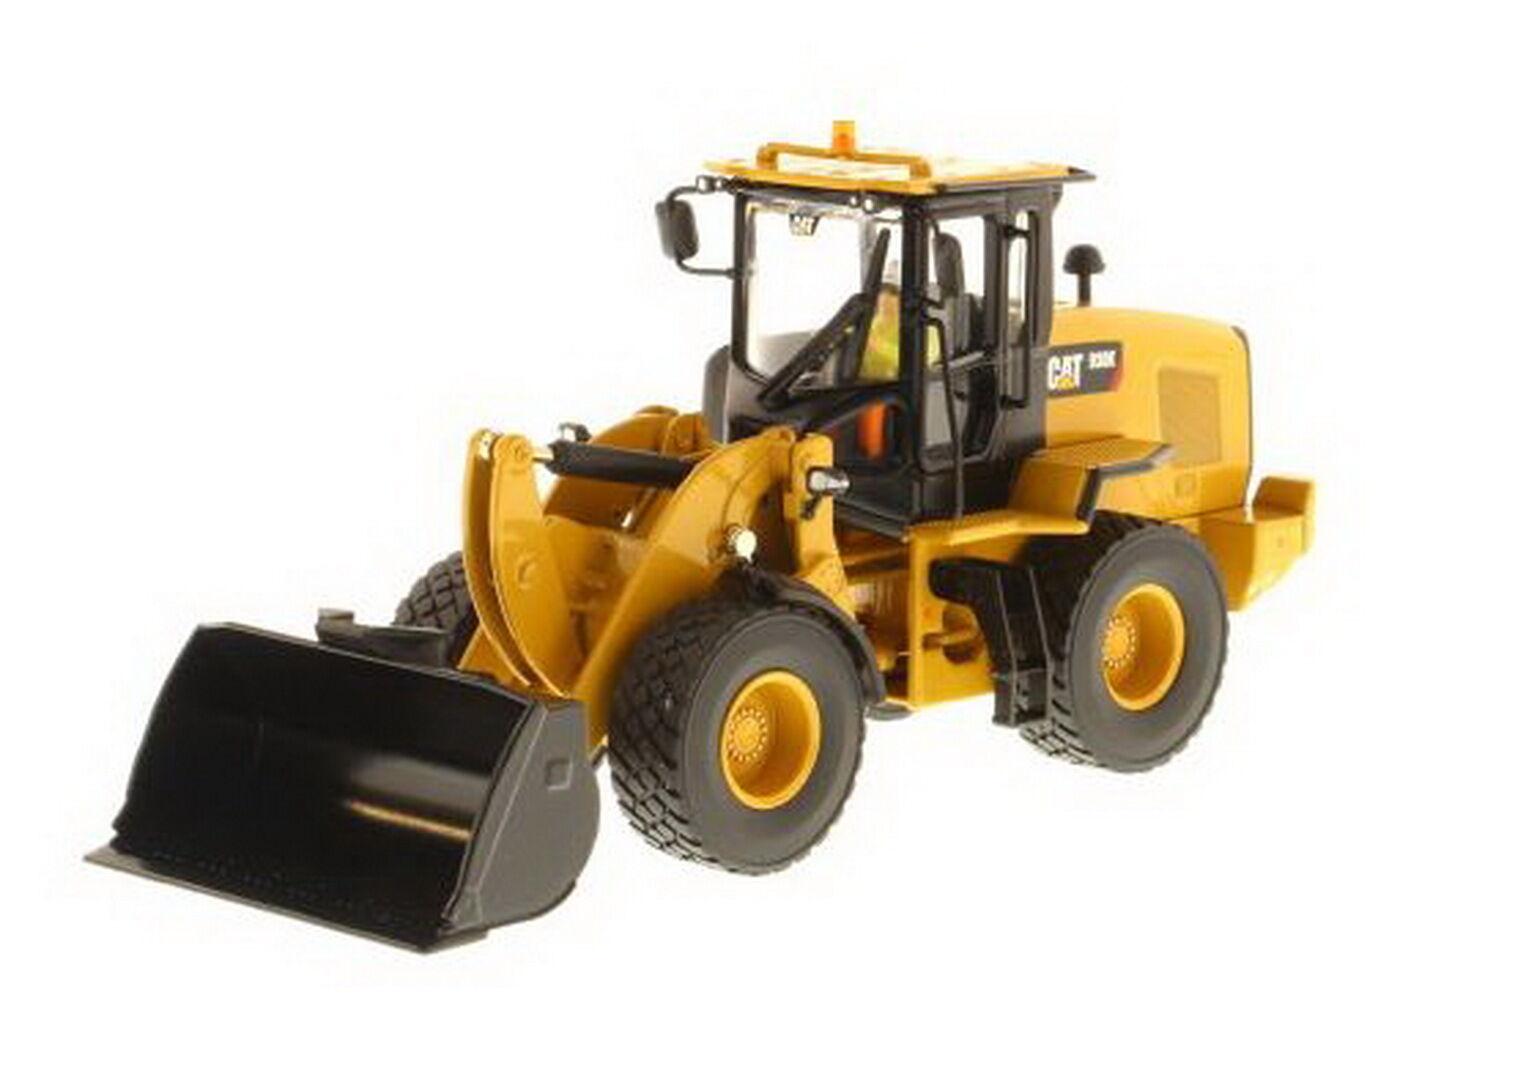 1 50 DM CATERPILLAR  CAT 930K Wheel Loader Diecast Model  85266  jusqu'à 42% de réduction